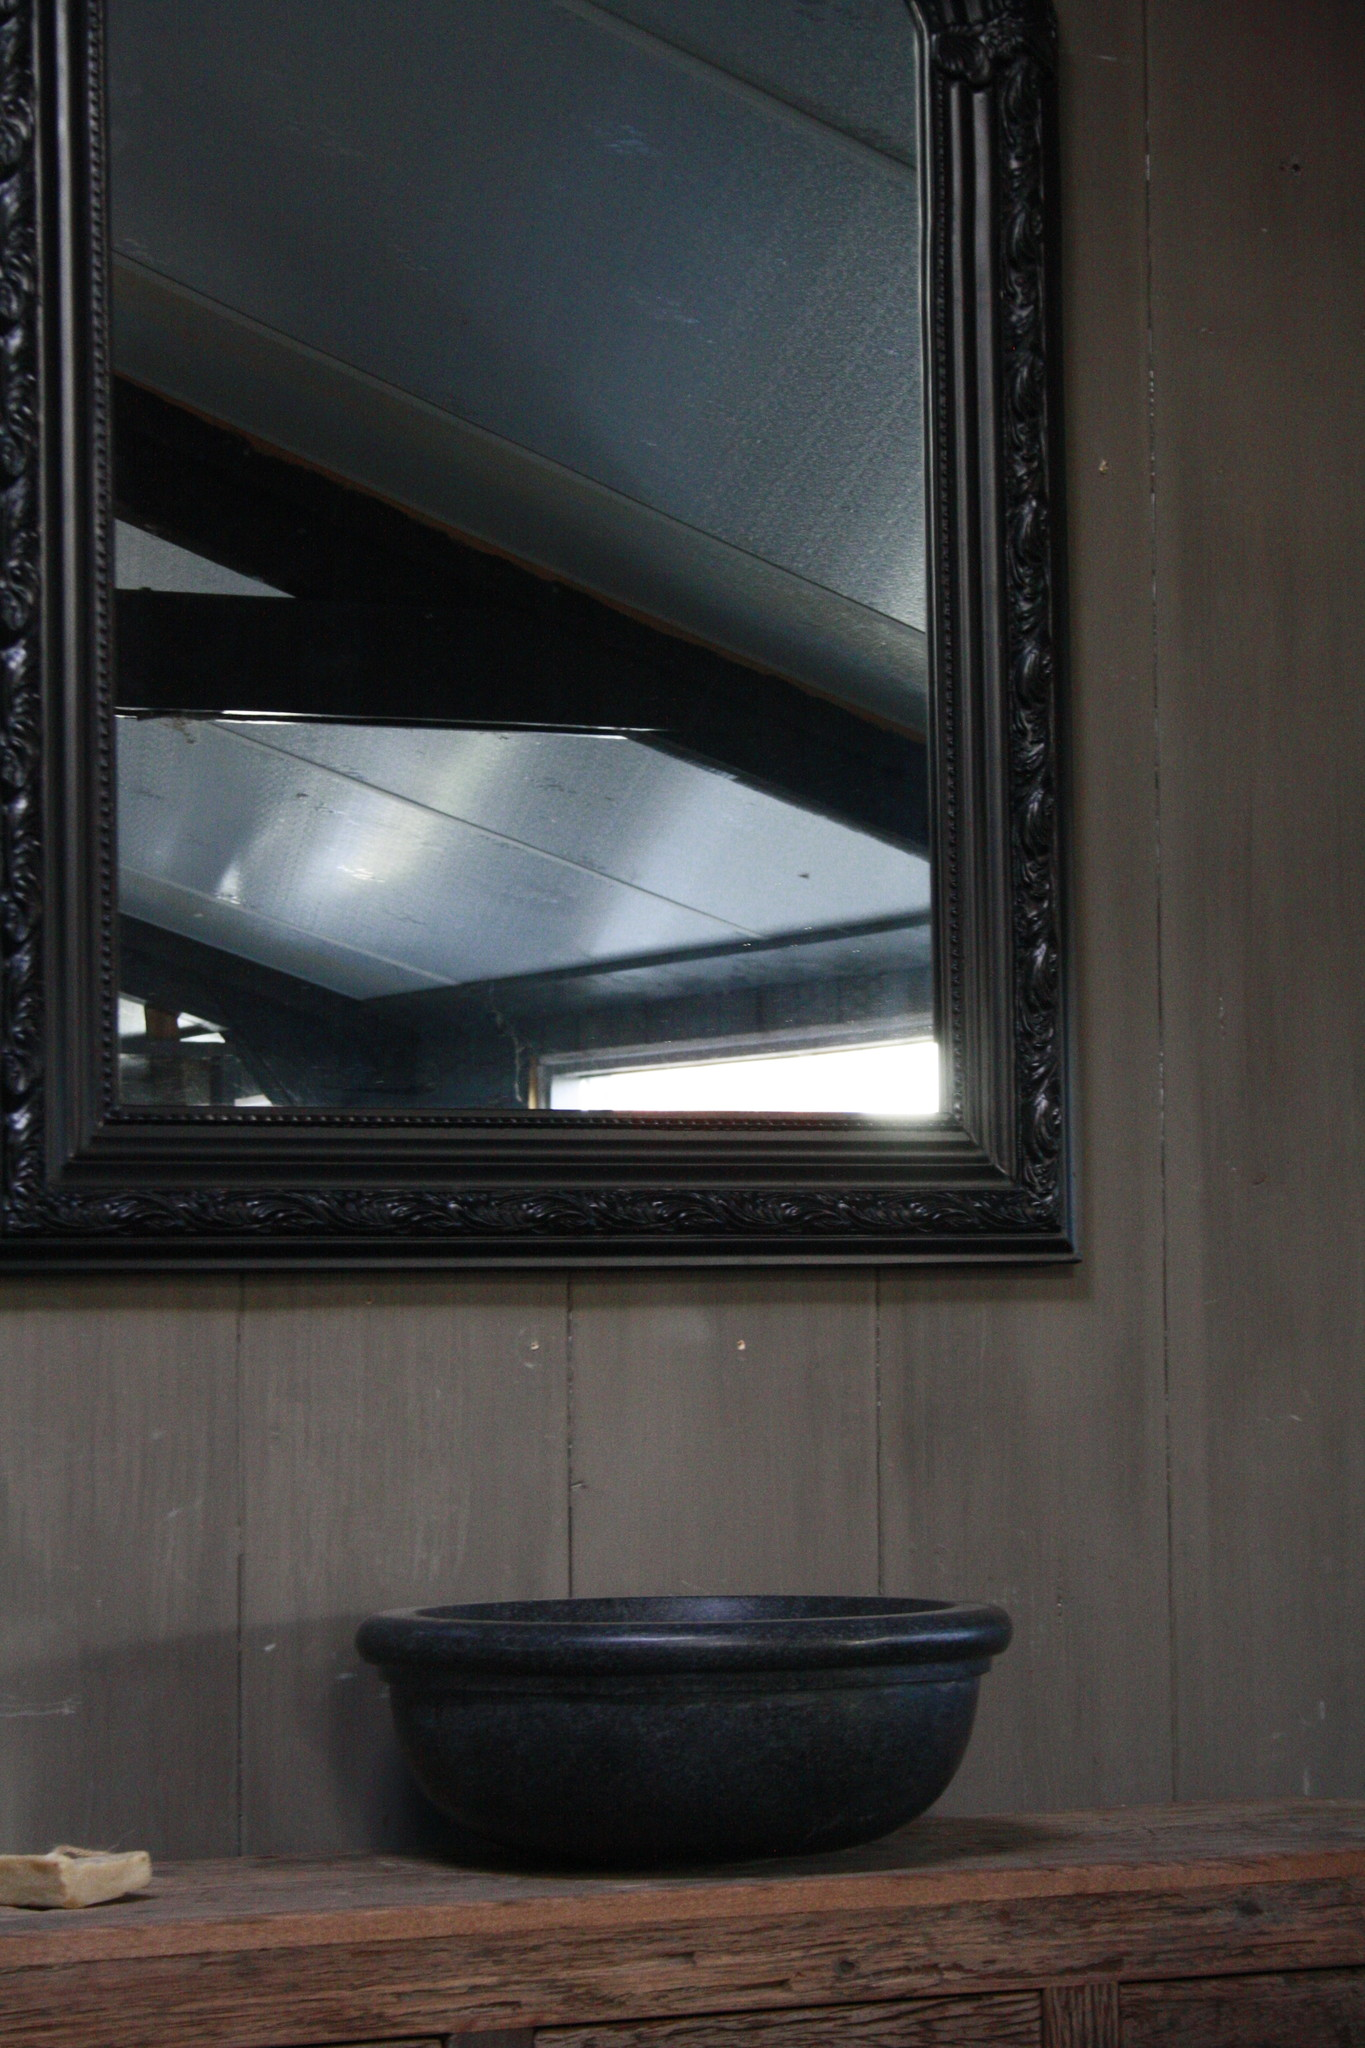 Kuifspiegel Barok Roma Black 117 x 80 cm-5